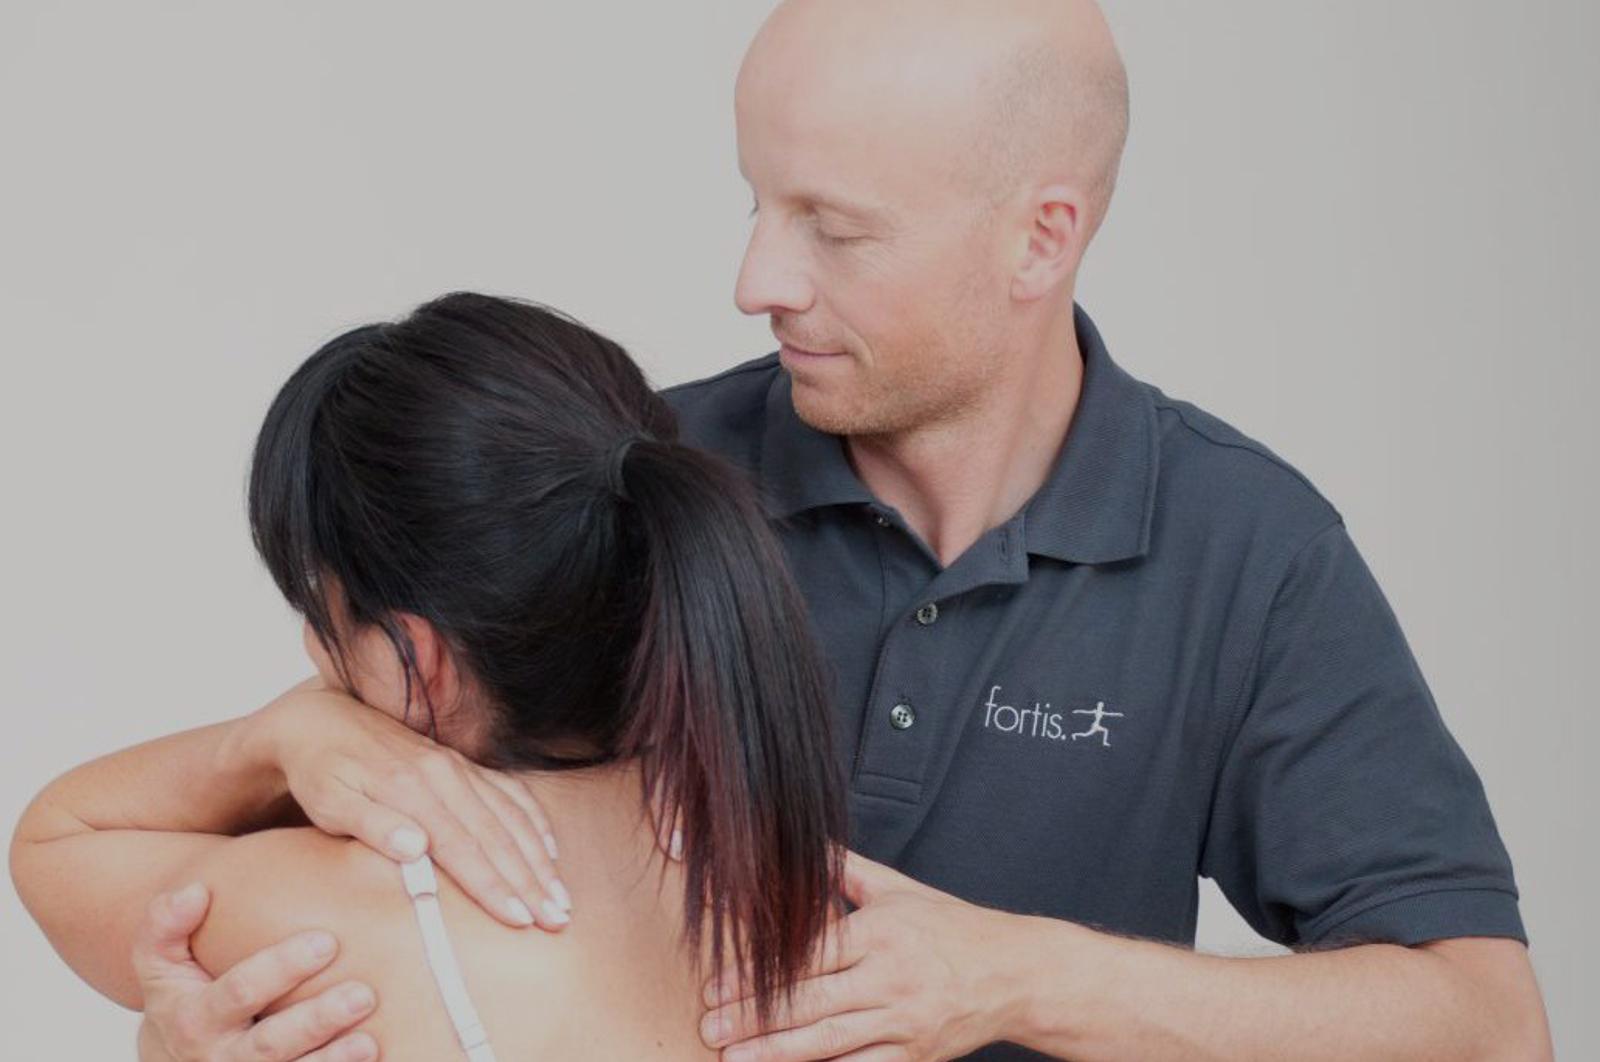 fortis® Therapie